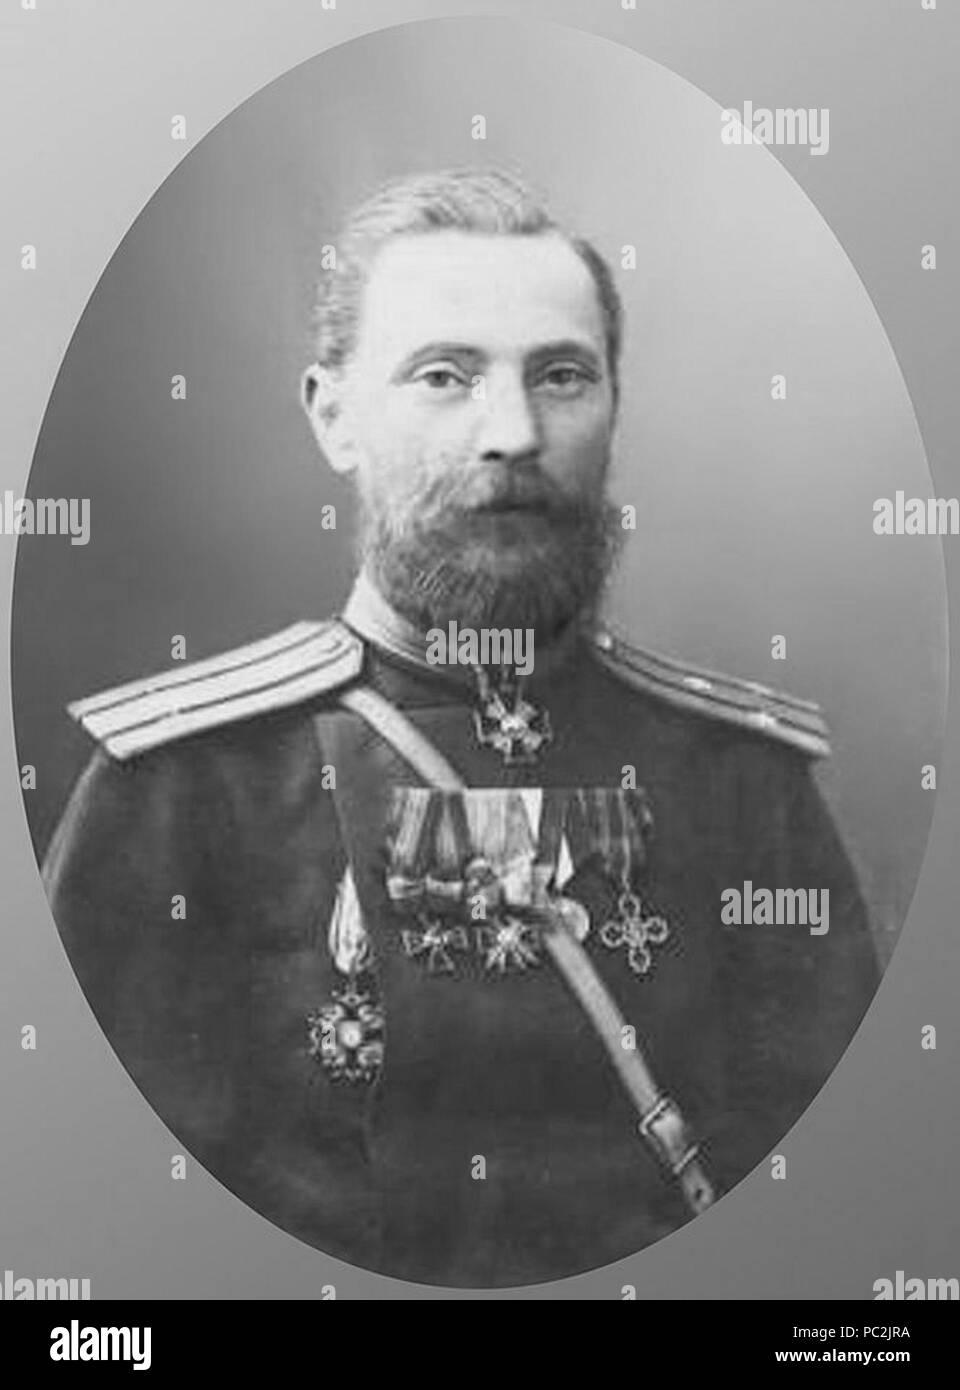 470 Patsevich Gregory Mikhailovich Stock Photo